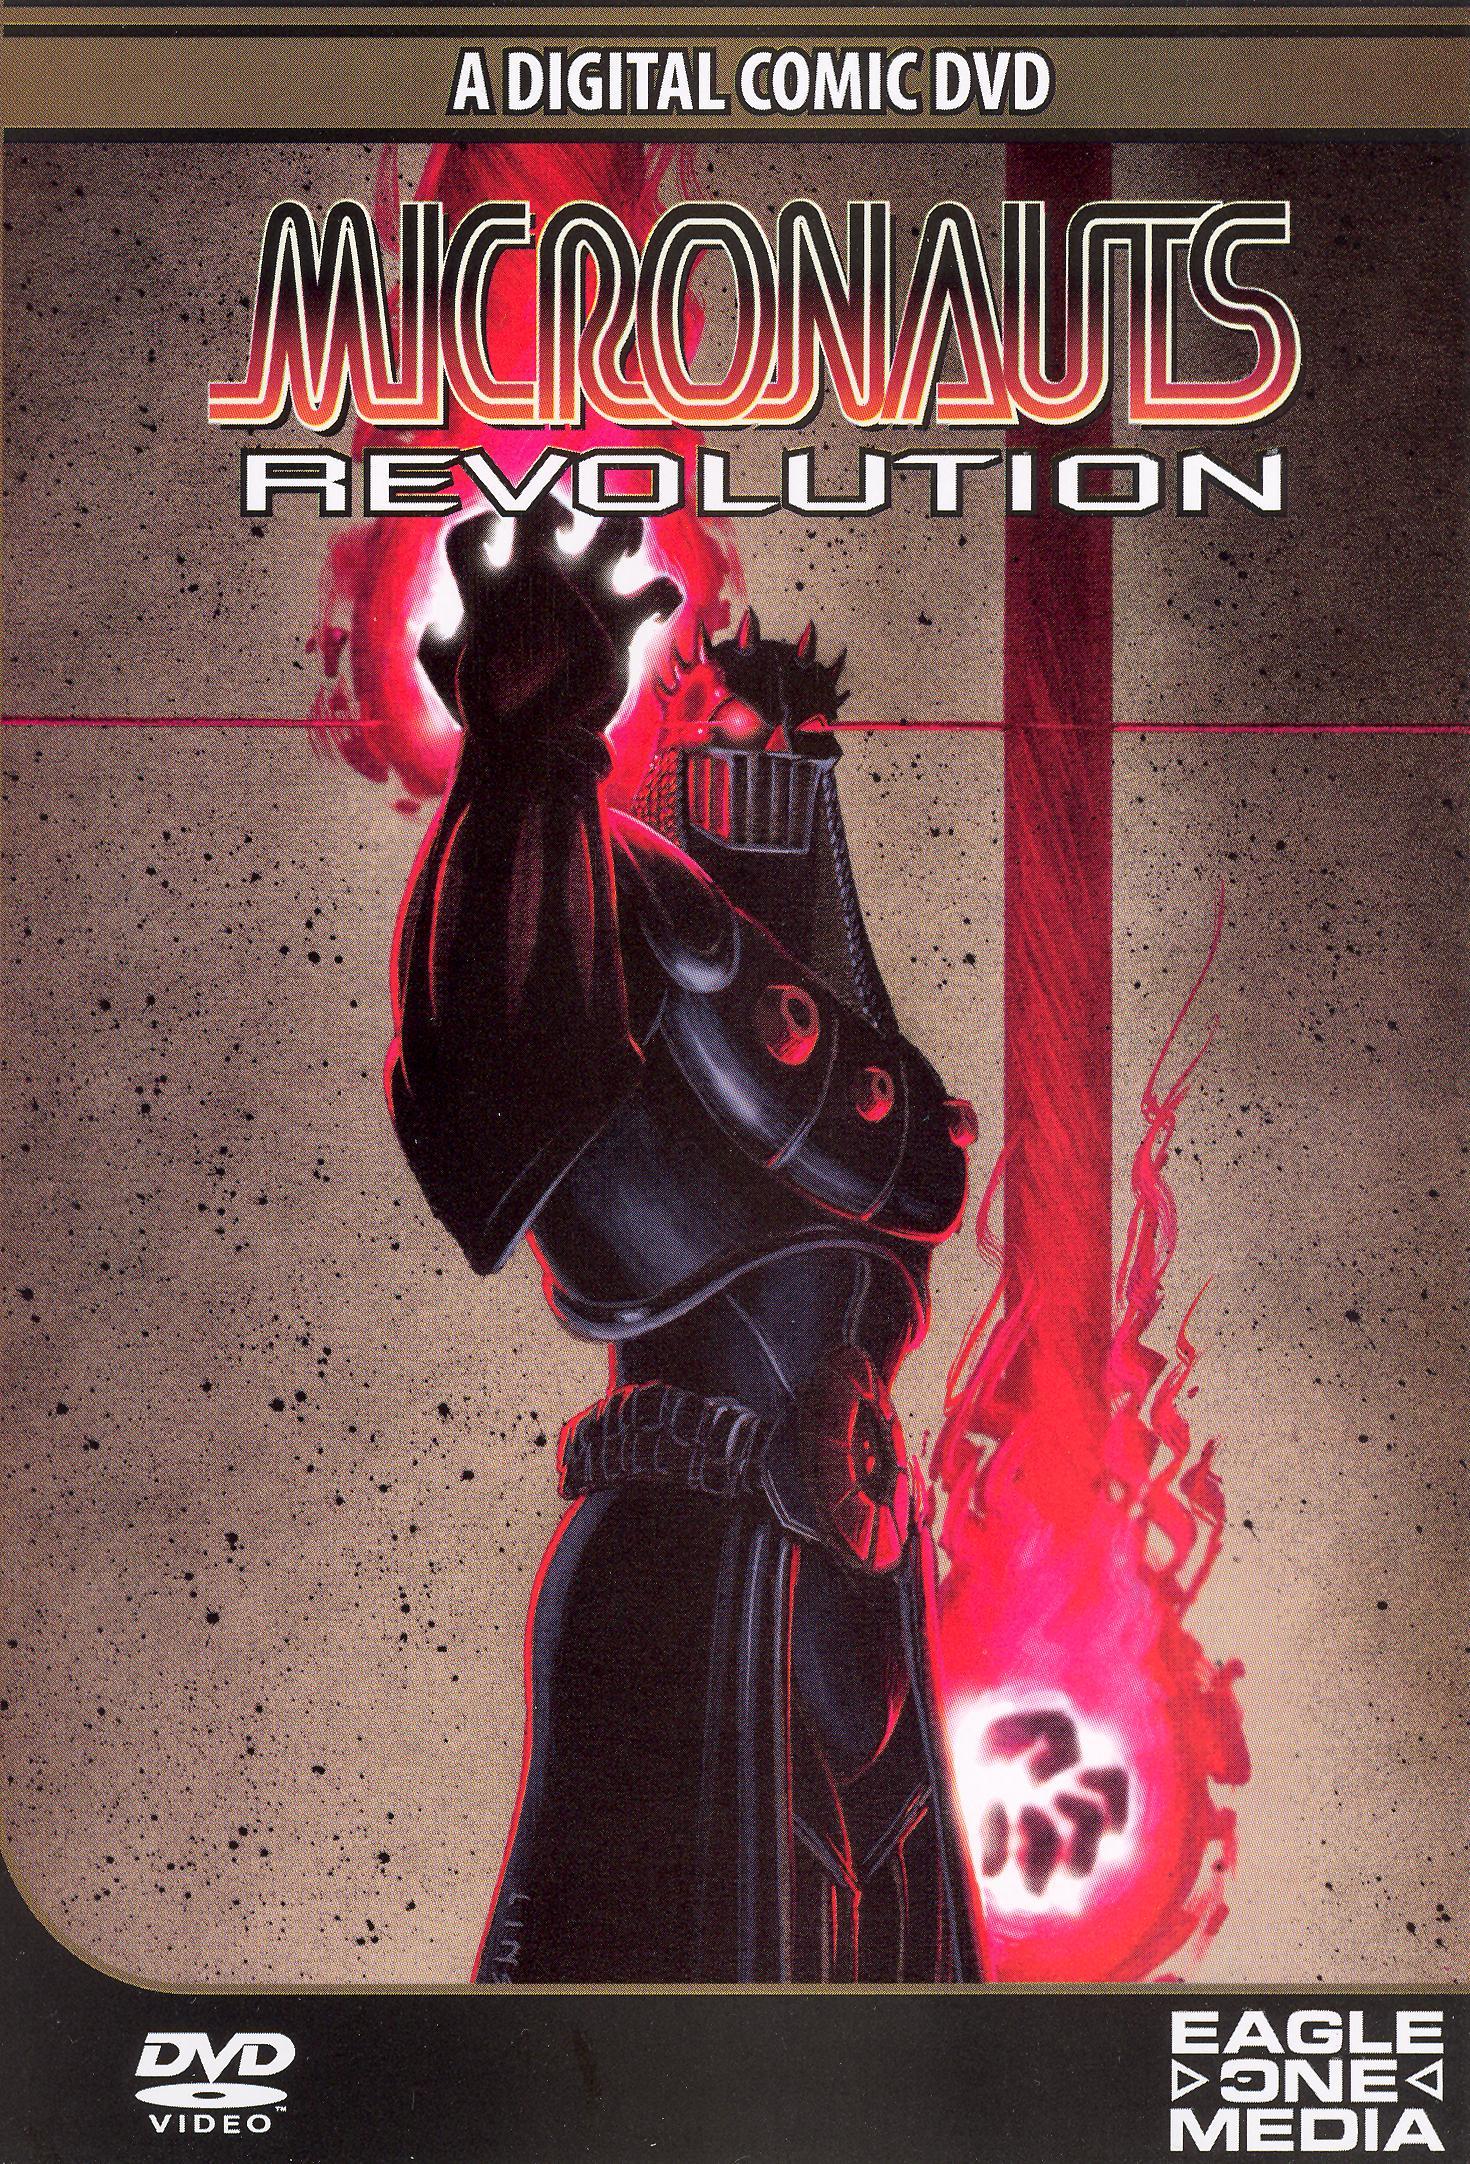 Micronauts Revolution